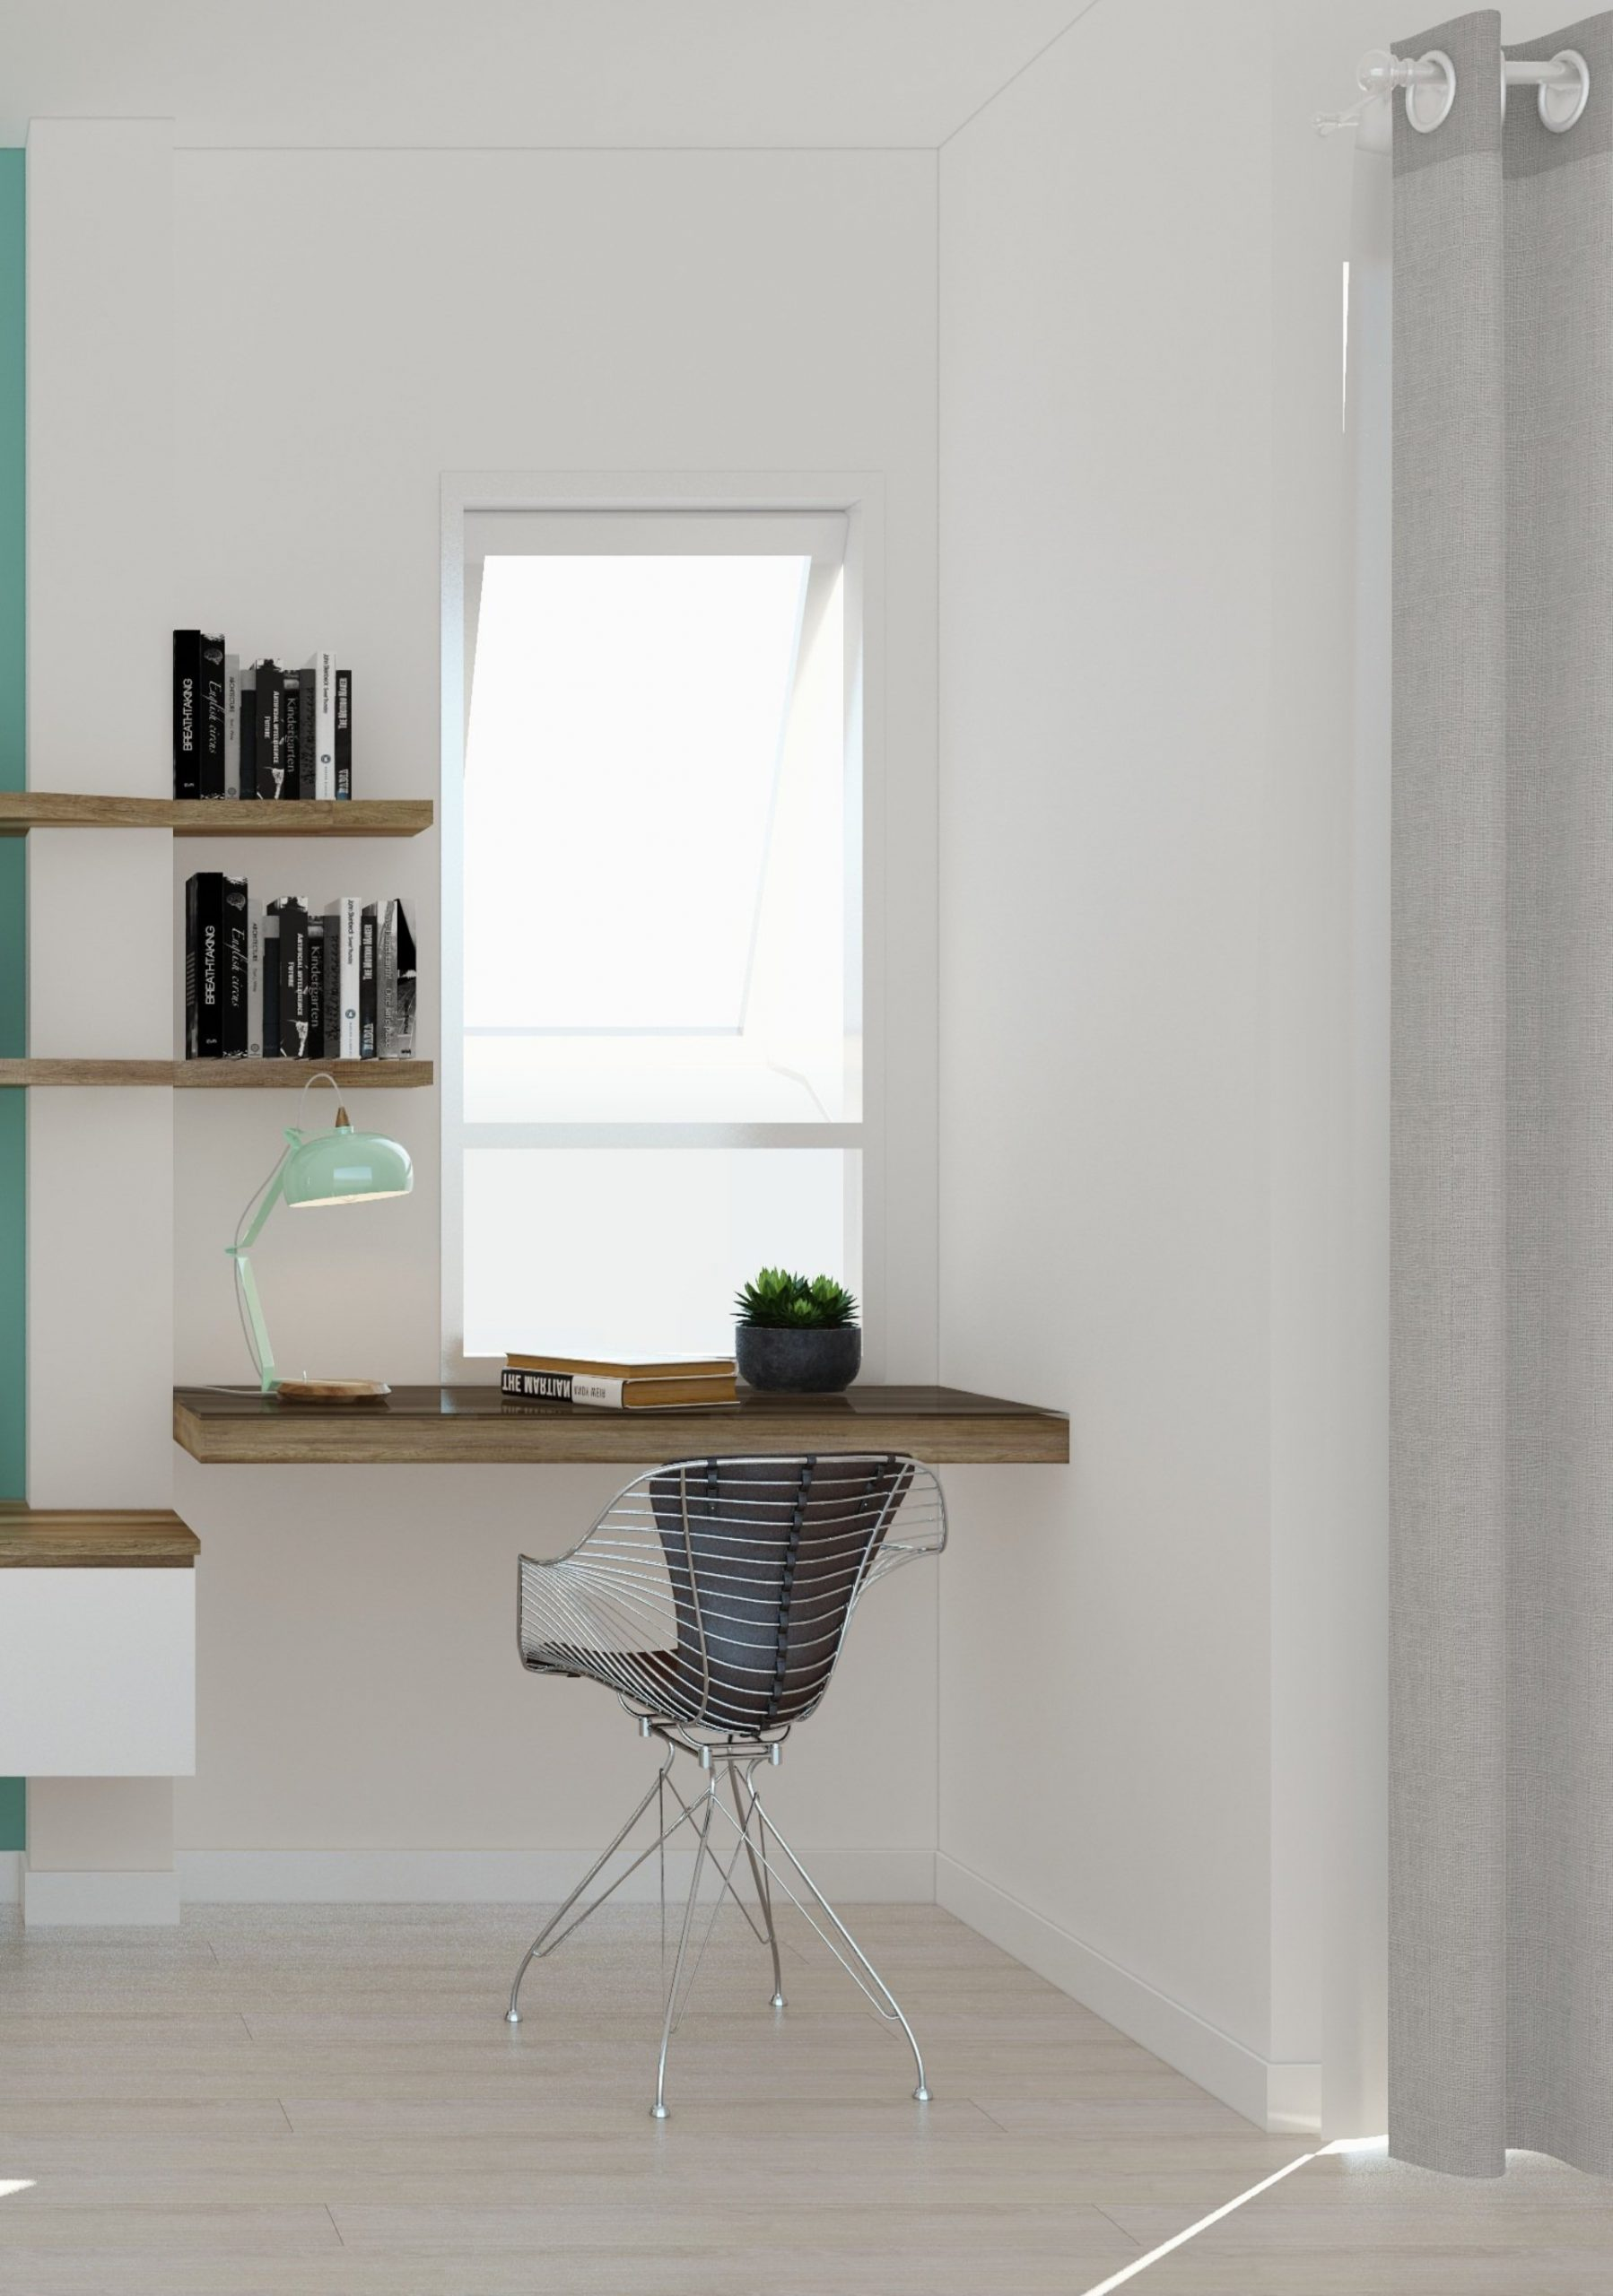 despacho2-virtual-home-staging-neutral-decor-6